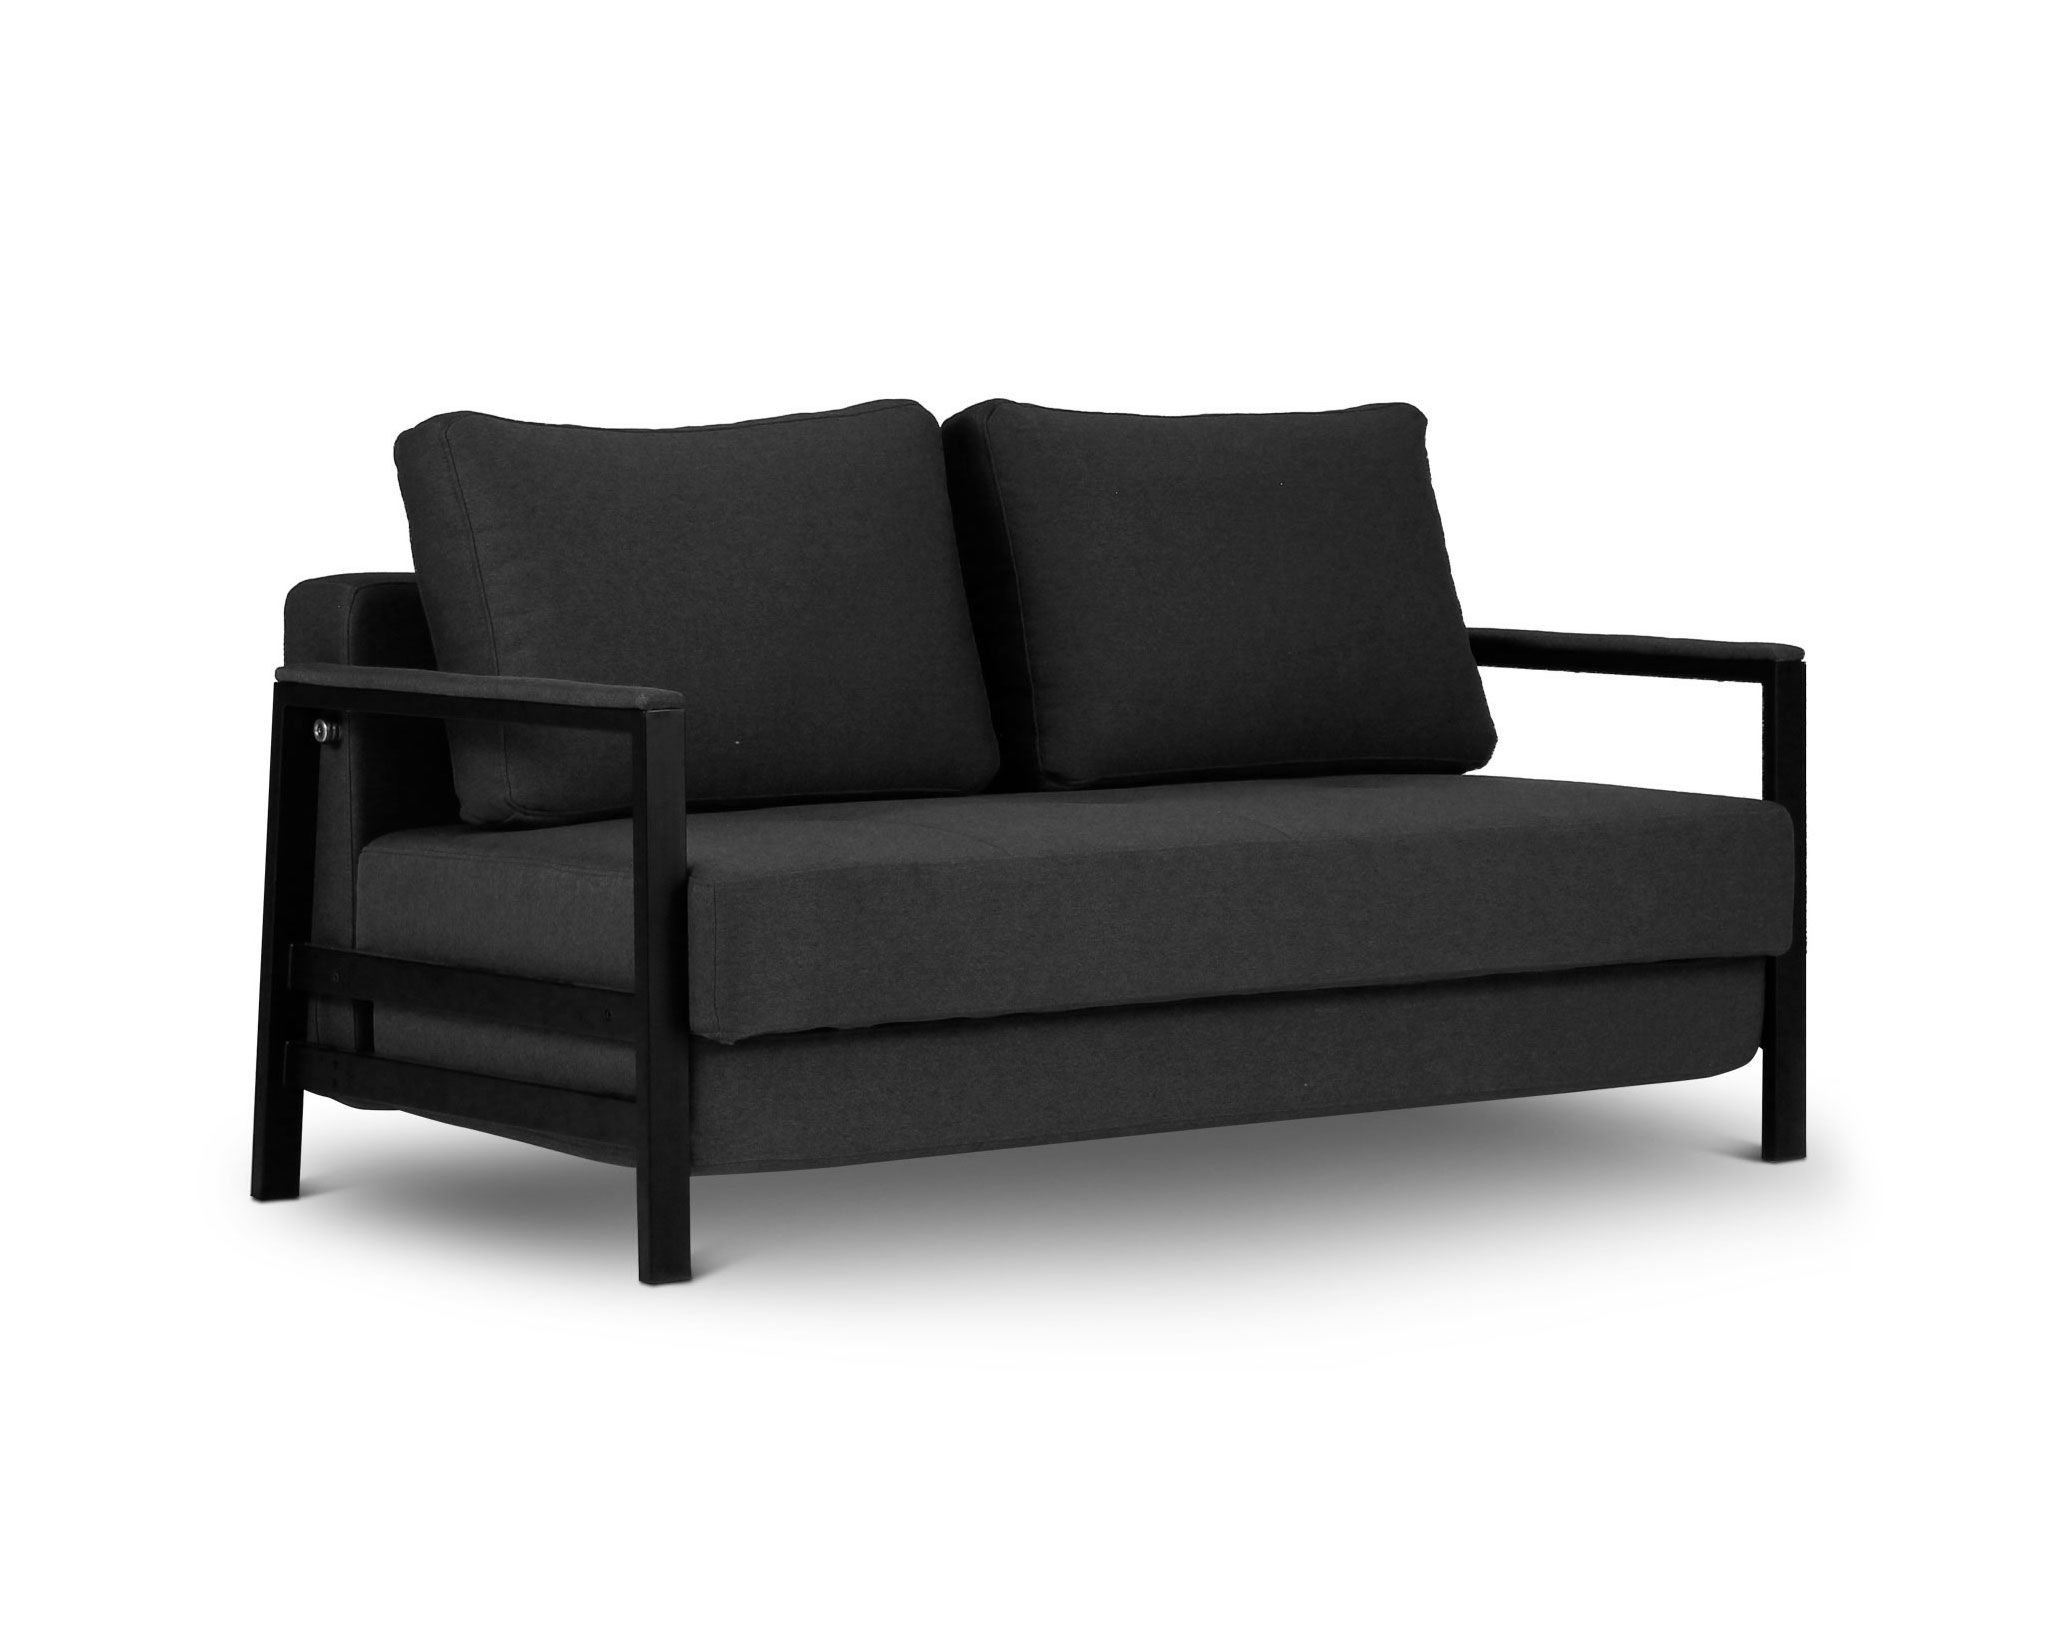 Kobe Fabric 2 Seat Sofa Bed Black sofa, Sofa, Sofa bed